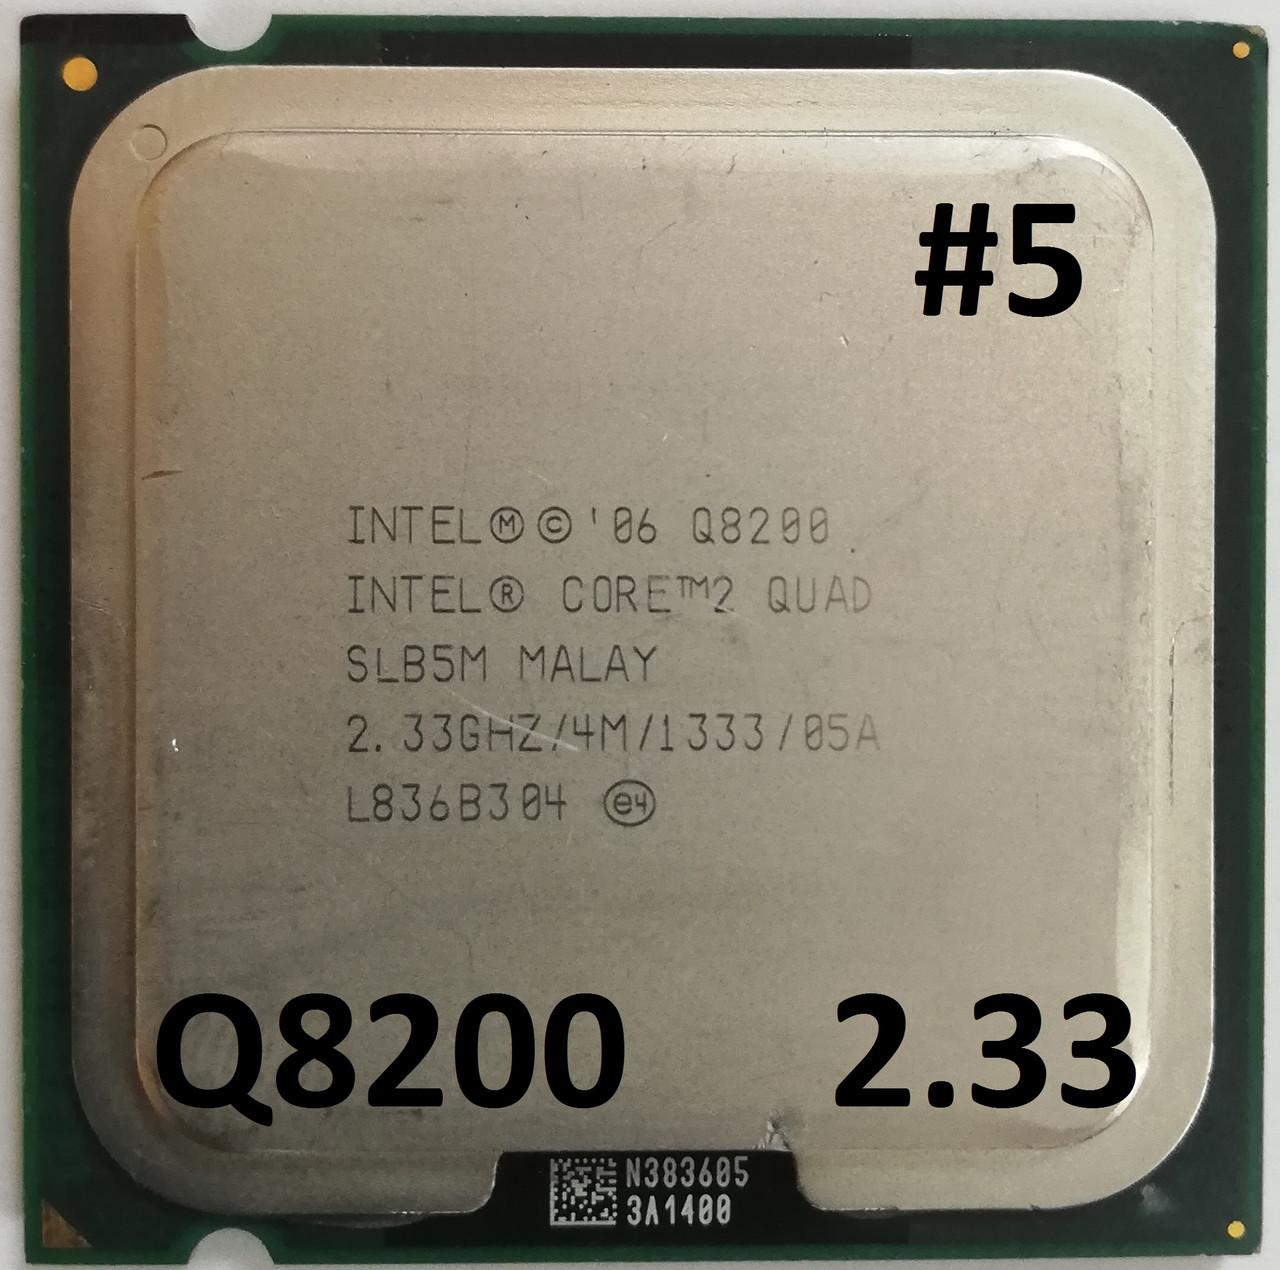 Процессор ЛОТ#5 Intel® Core™2 Quad Q8200 M1 SLB5M 2.33GHz 4M Cache 1333 MHz FSB Socket 775 Б/У